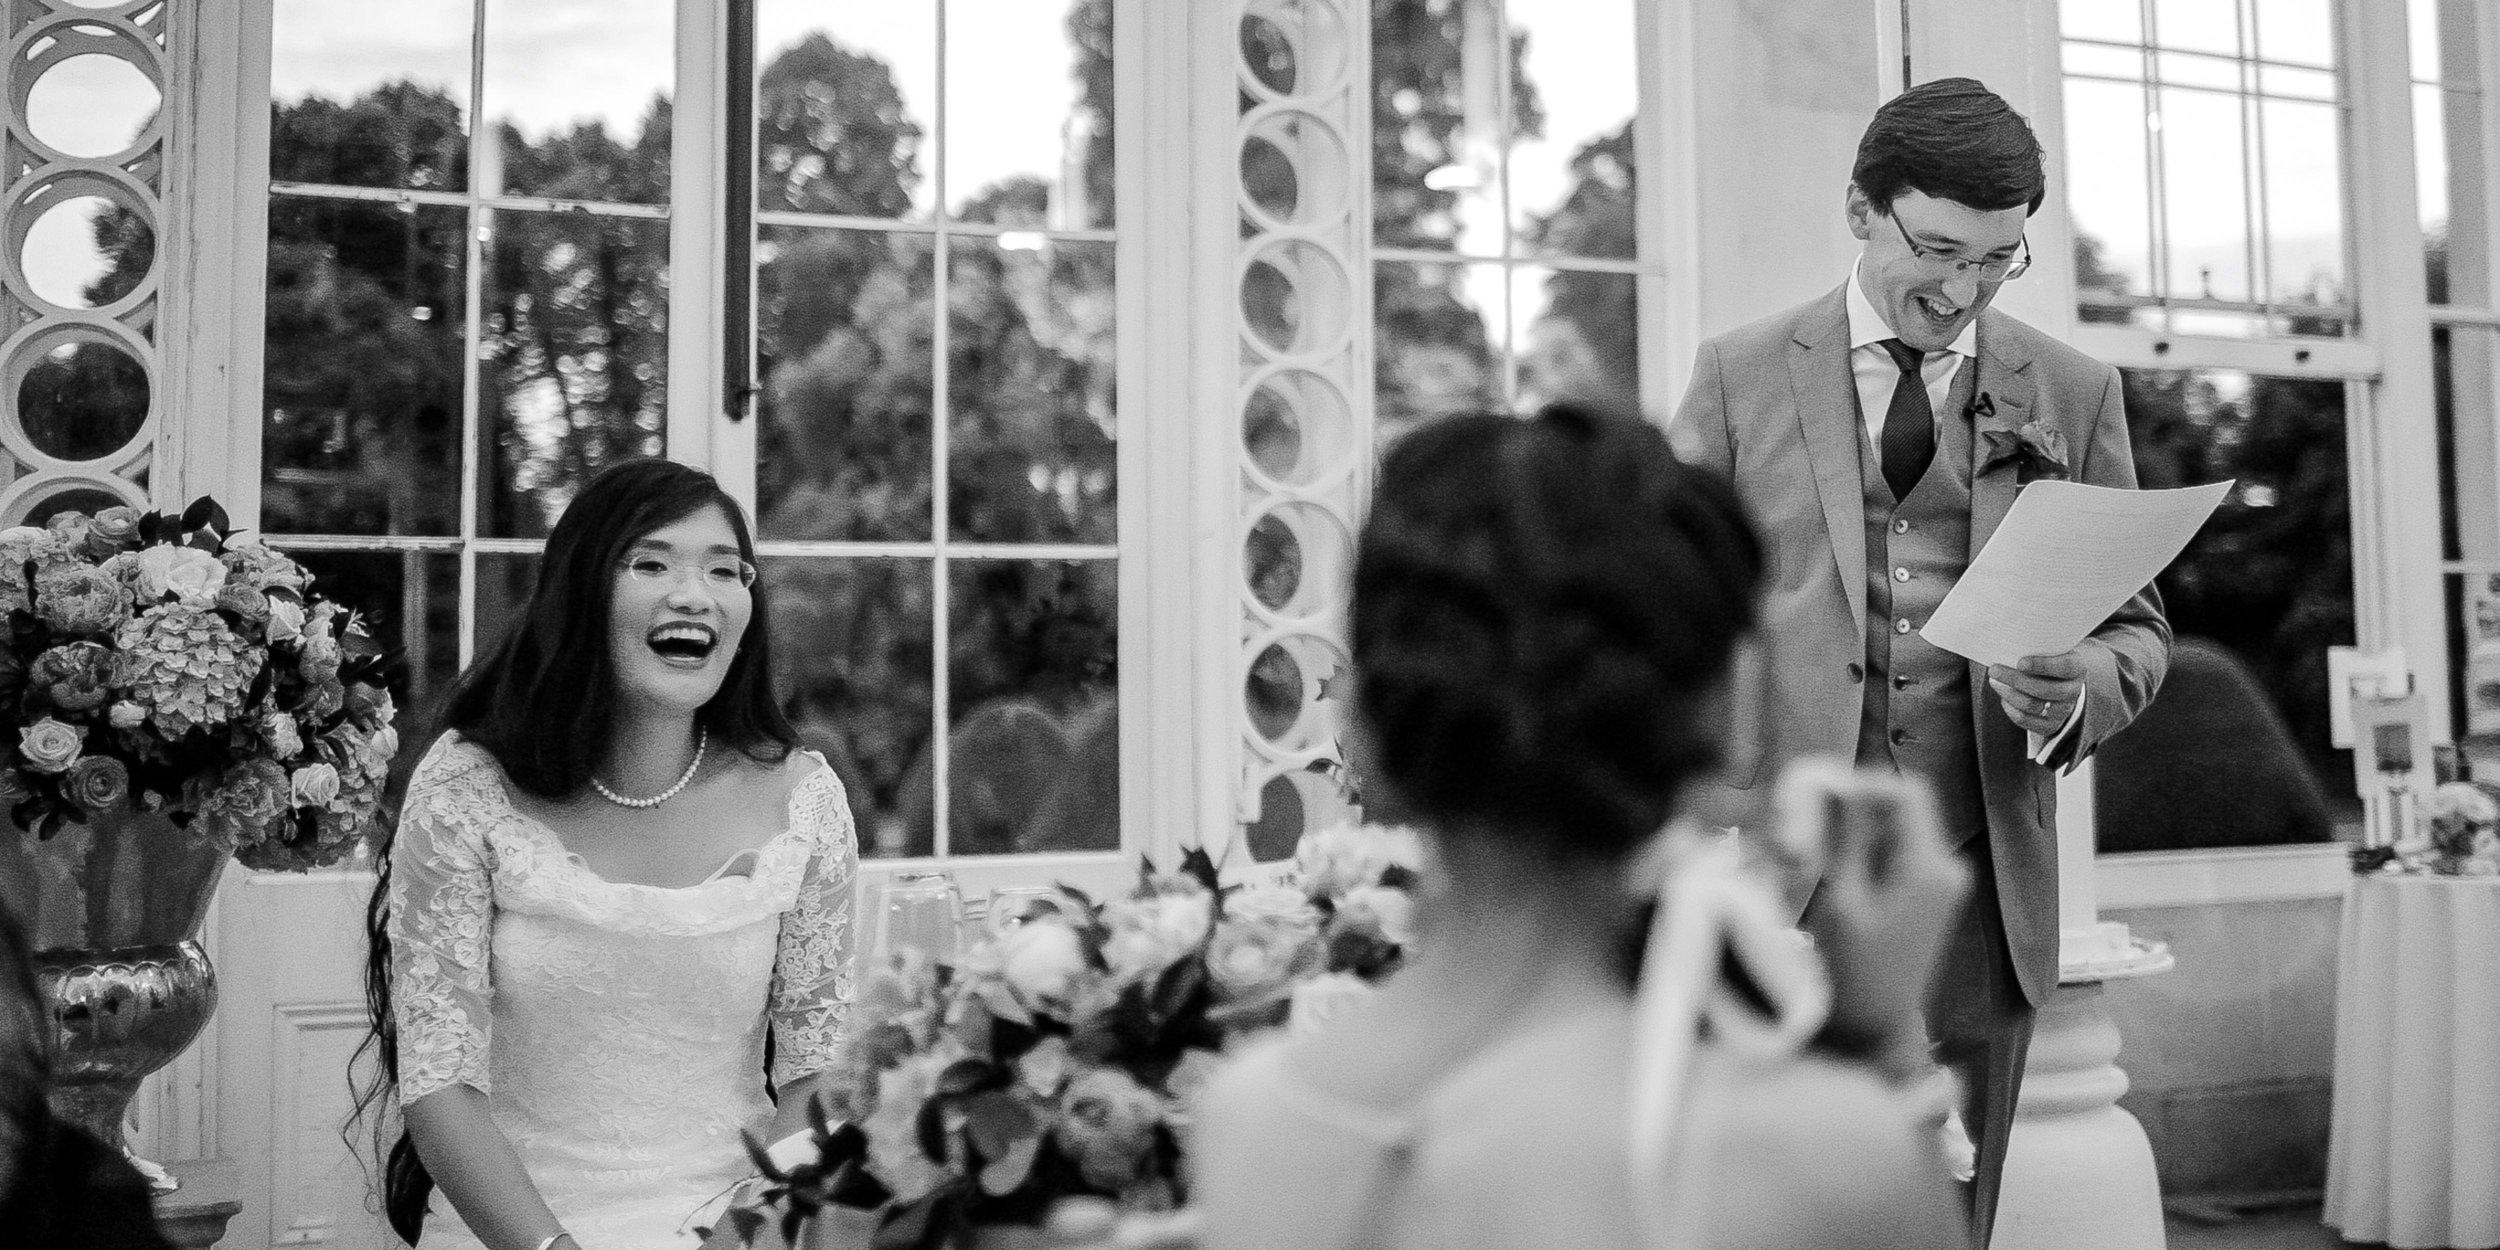 wedding_photographer_surrey_63.jpg